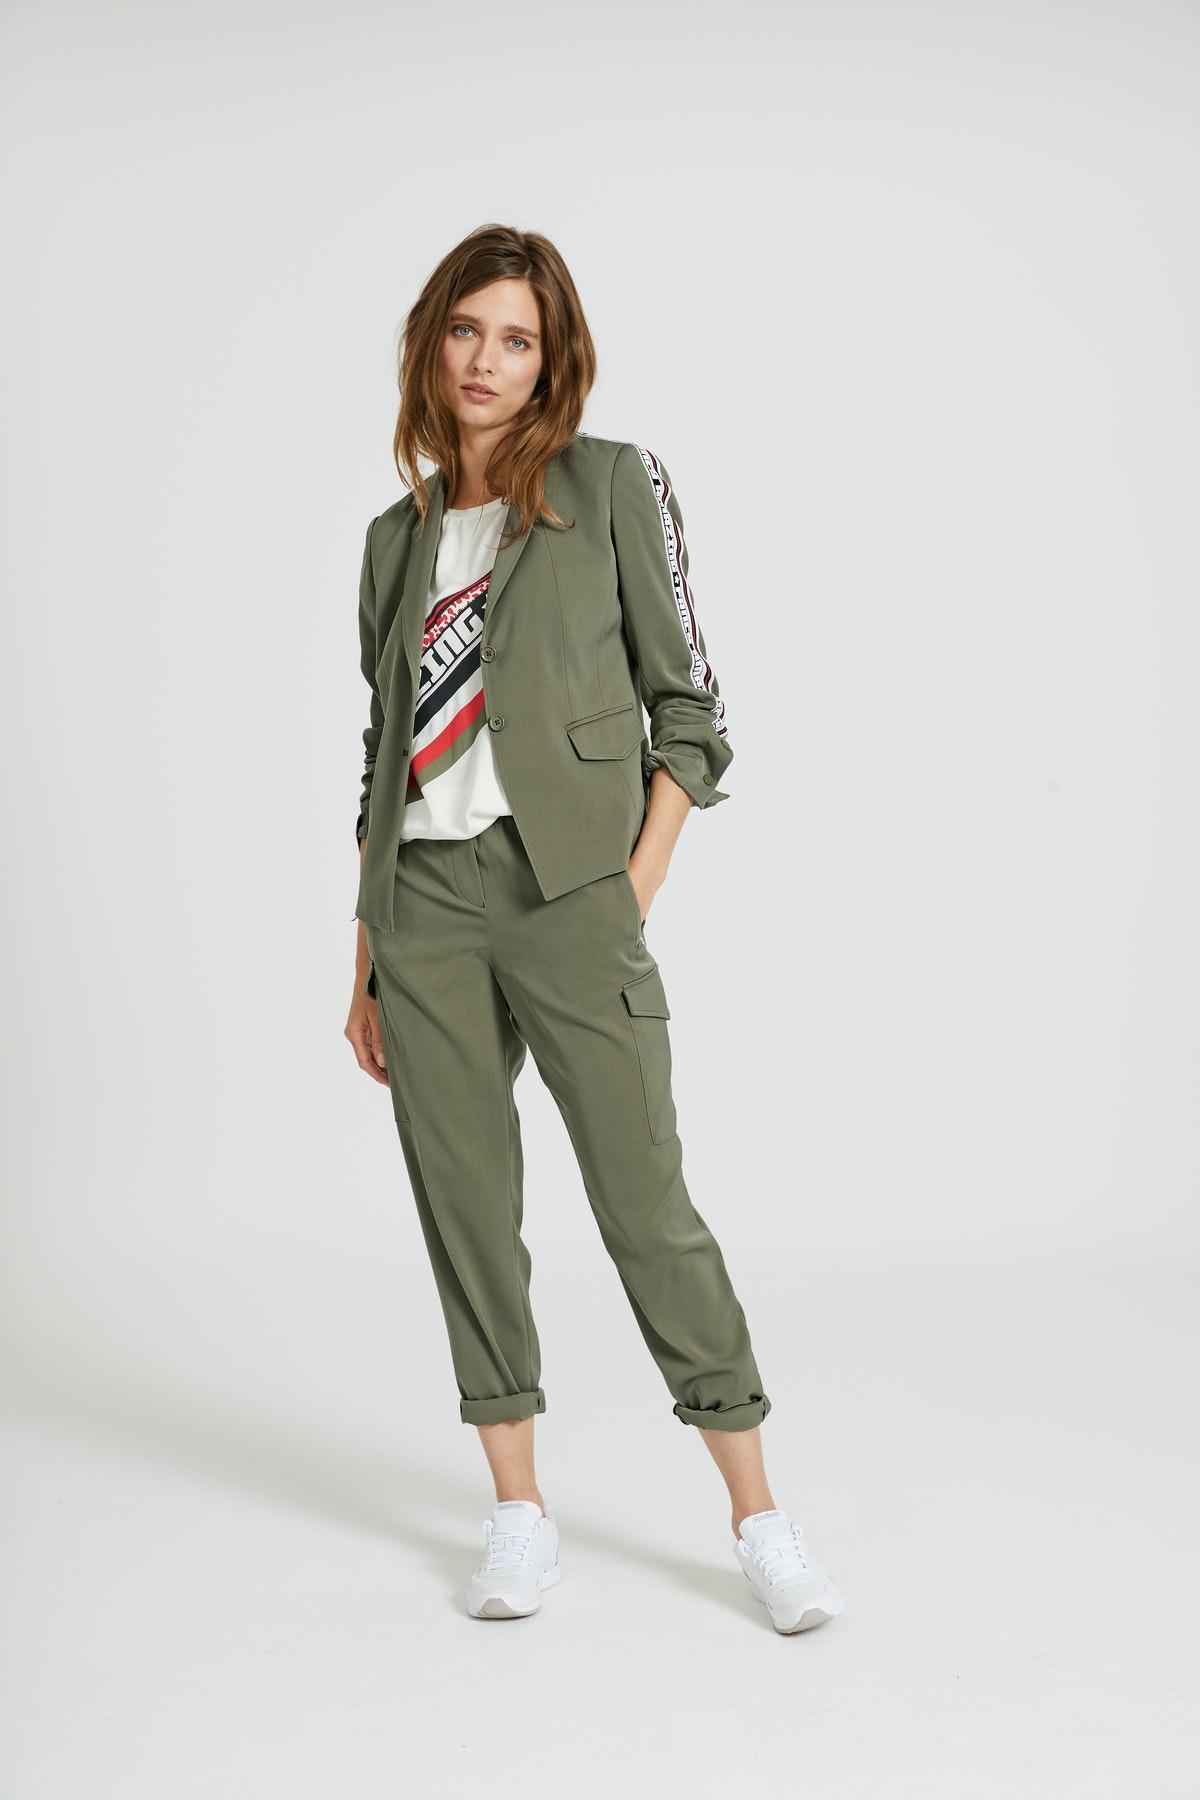 ncm-boutique-damenbekleidung-damenmode-heerbrugg-st. gallen-marc-aurel-spring-summer-2020-3